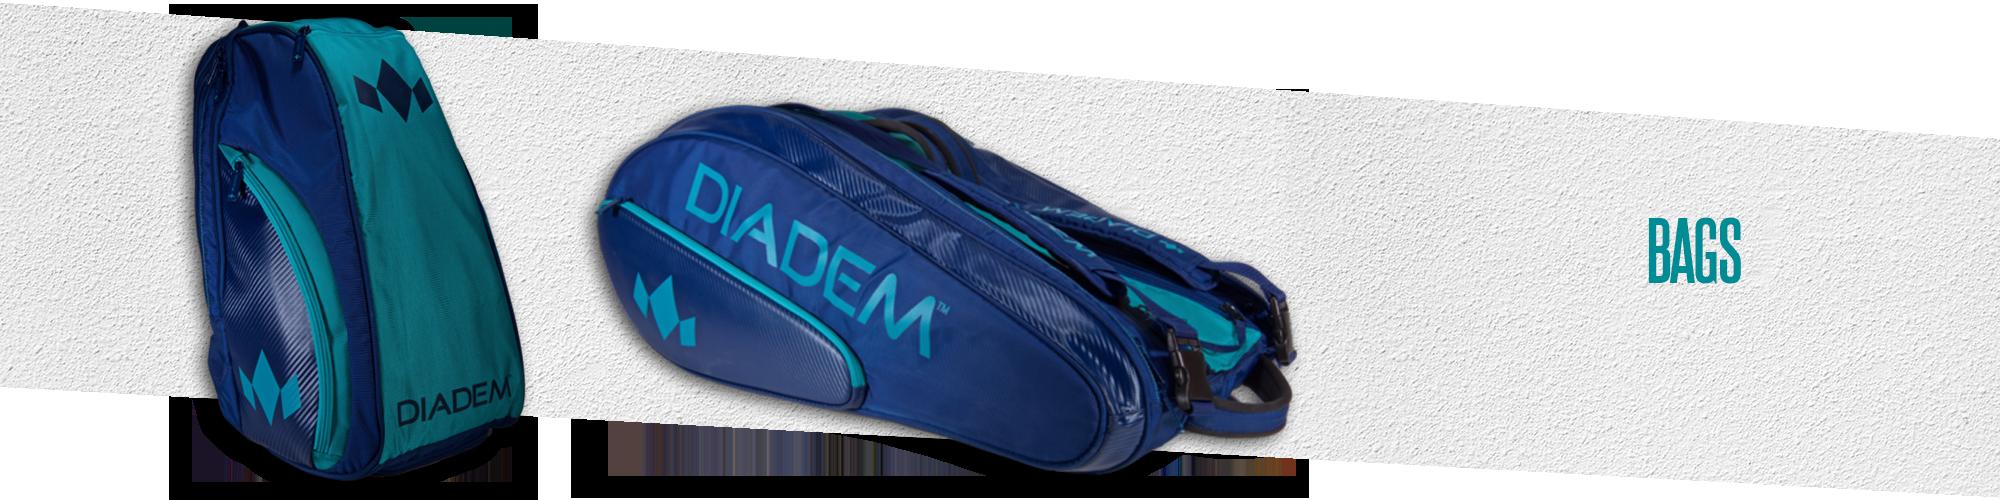 Diadem Sports South Africa